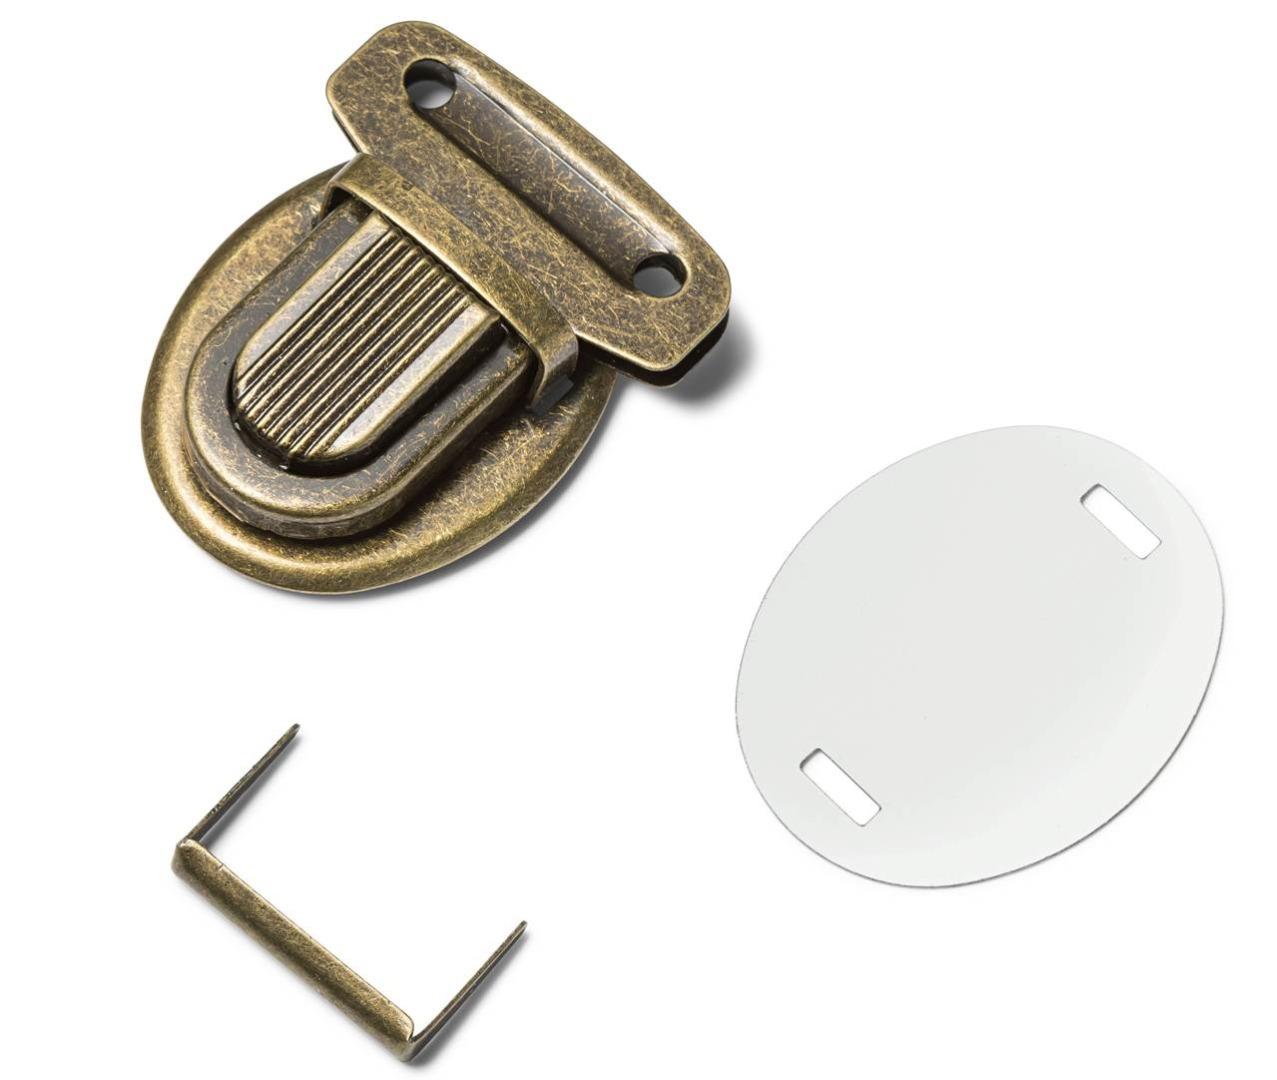 1Stk Steckschloß 26 mm Prym altmessing